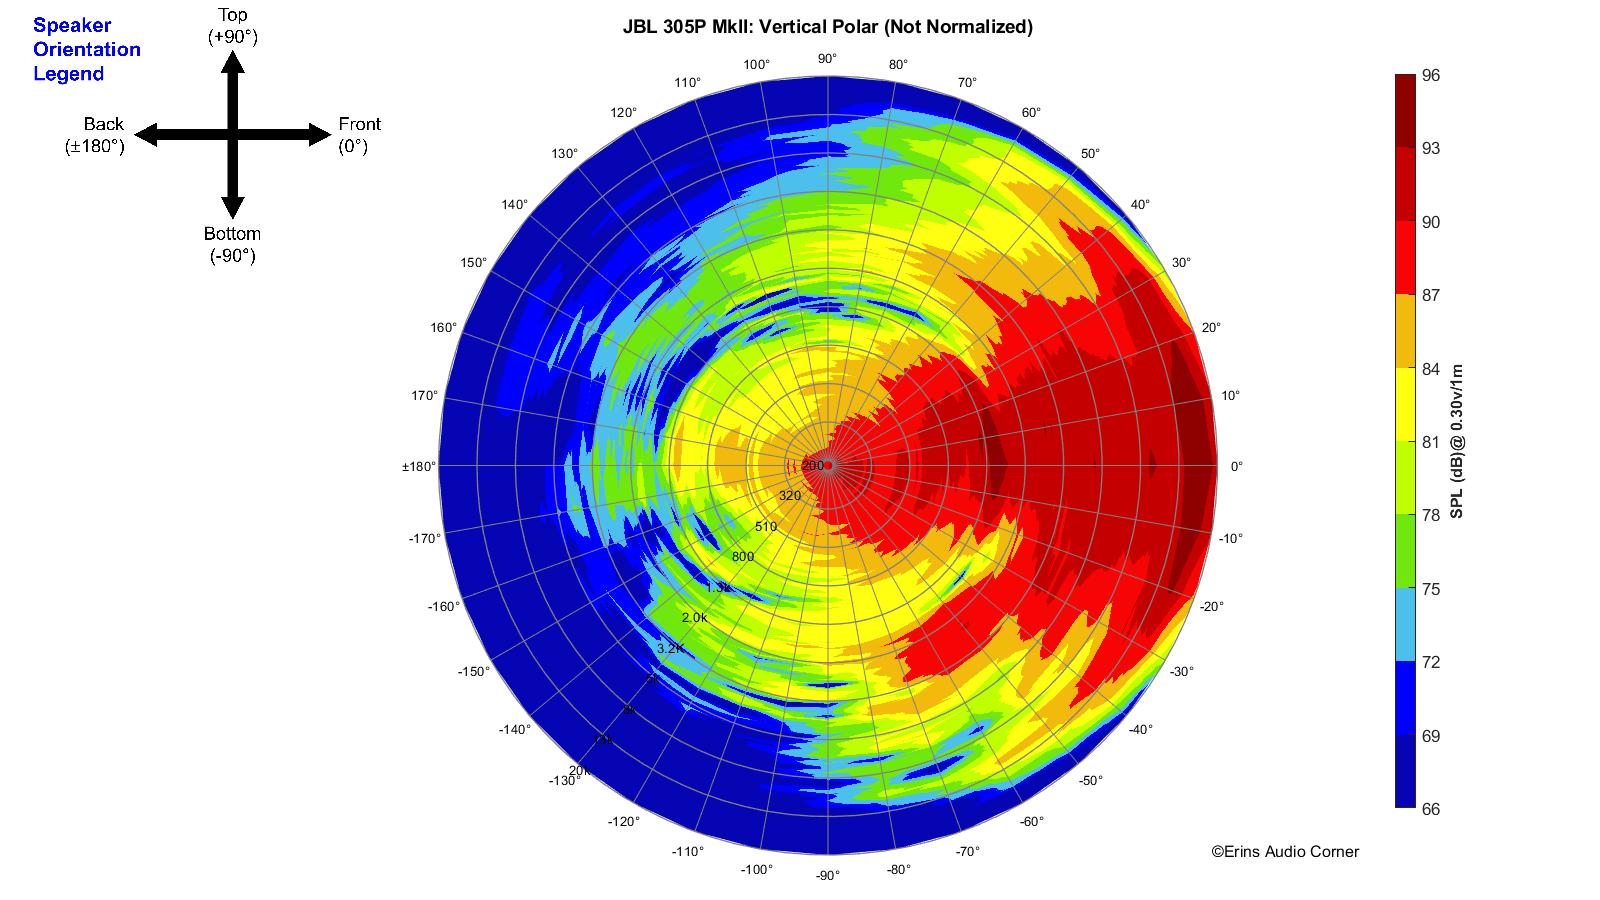 JBL%20305P%20MkII_360_Vertical_Polar.png